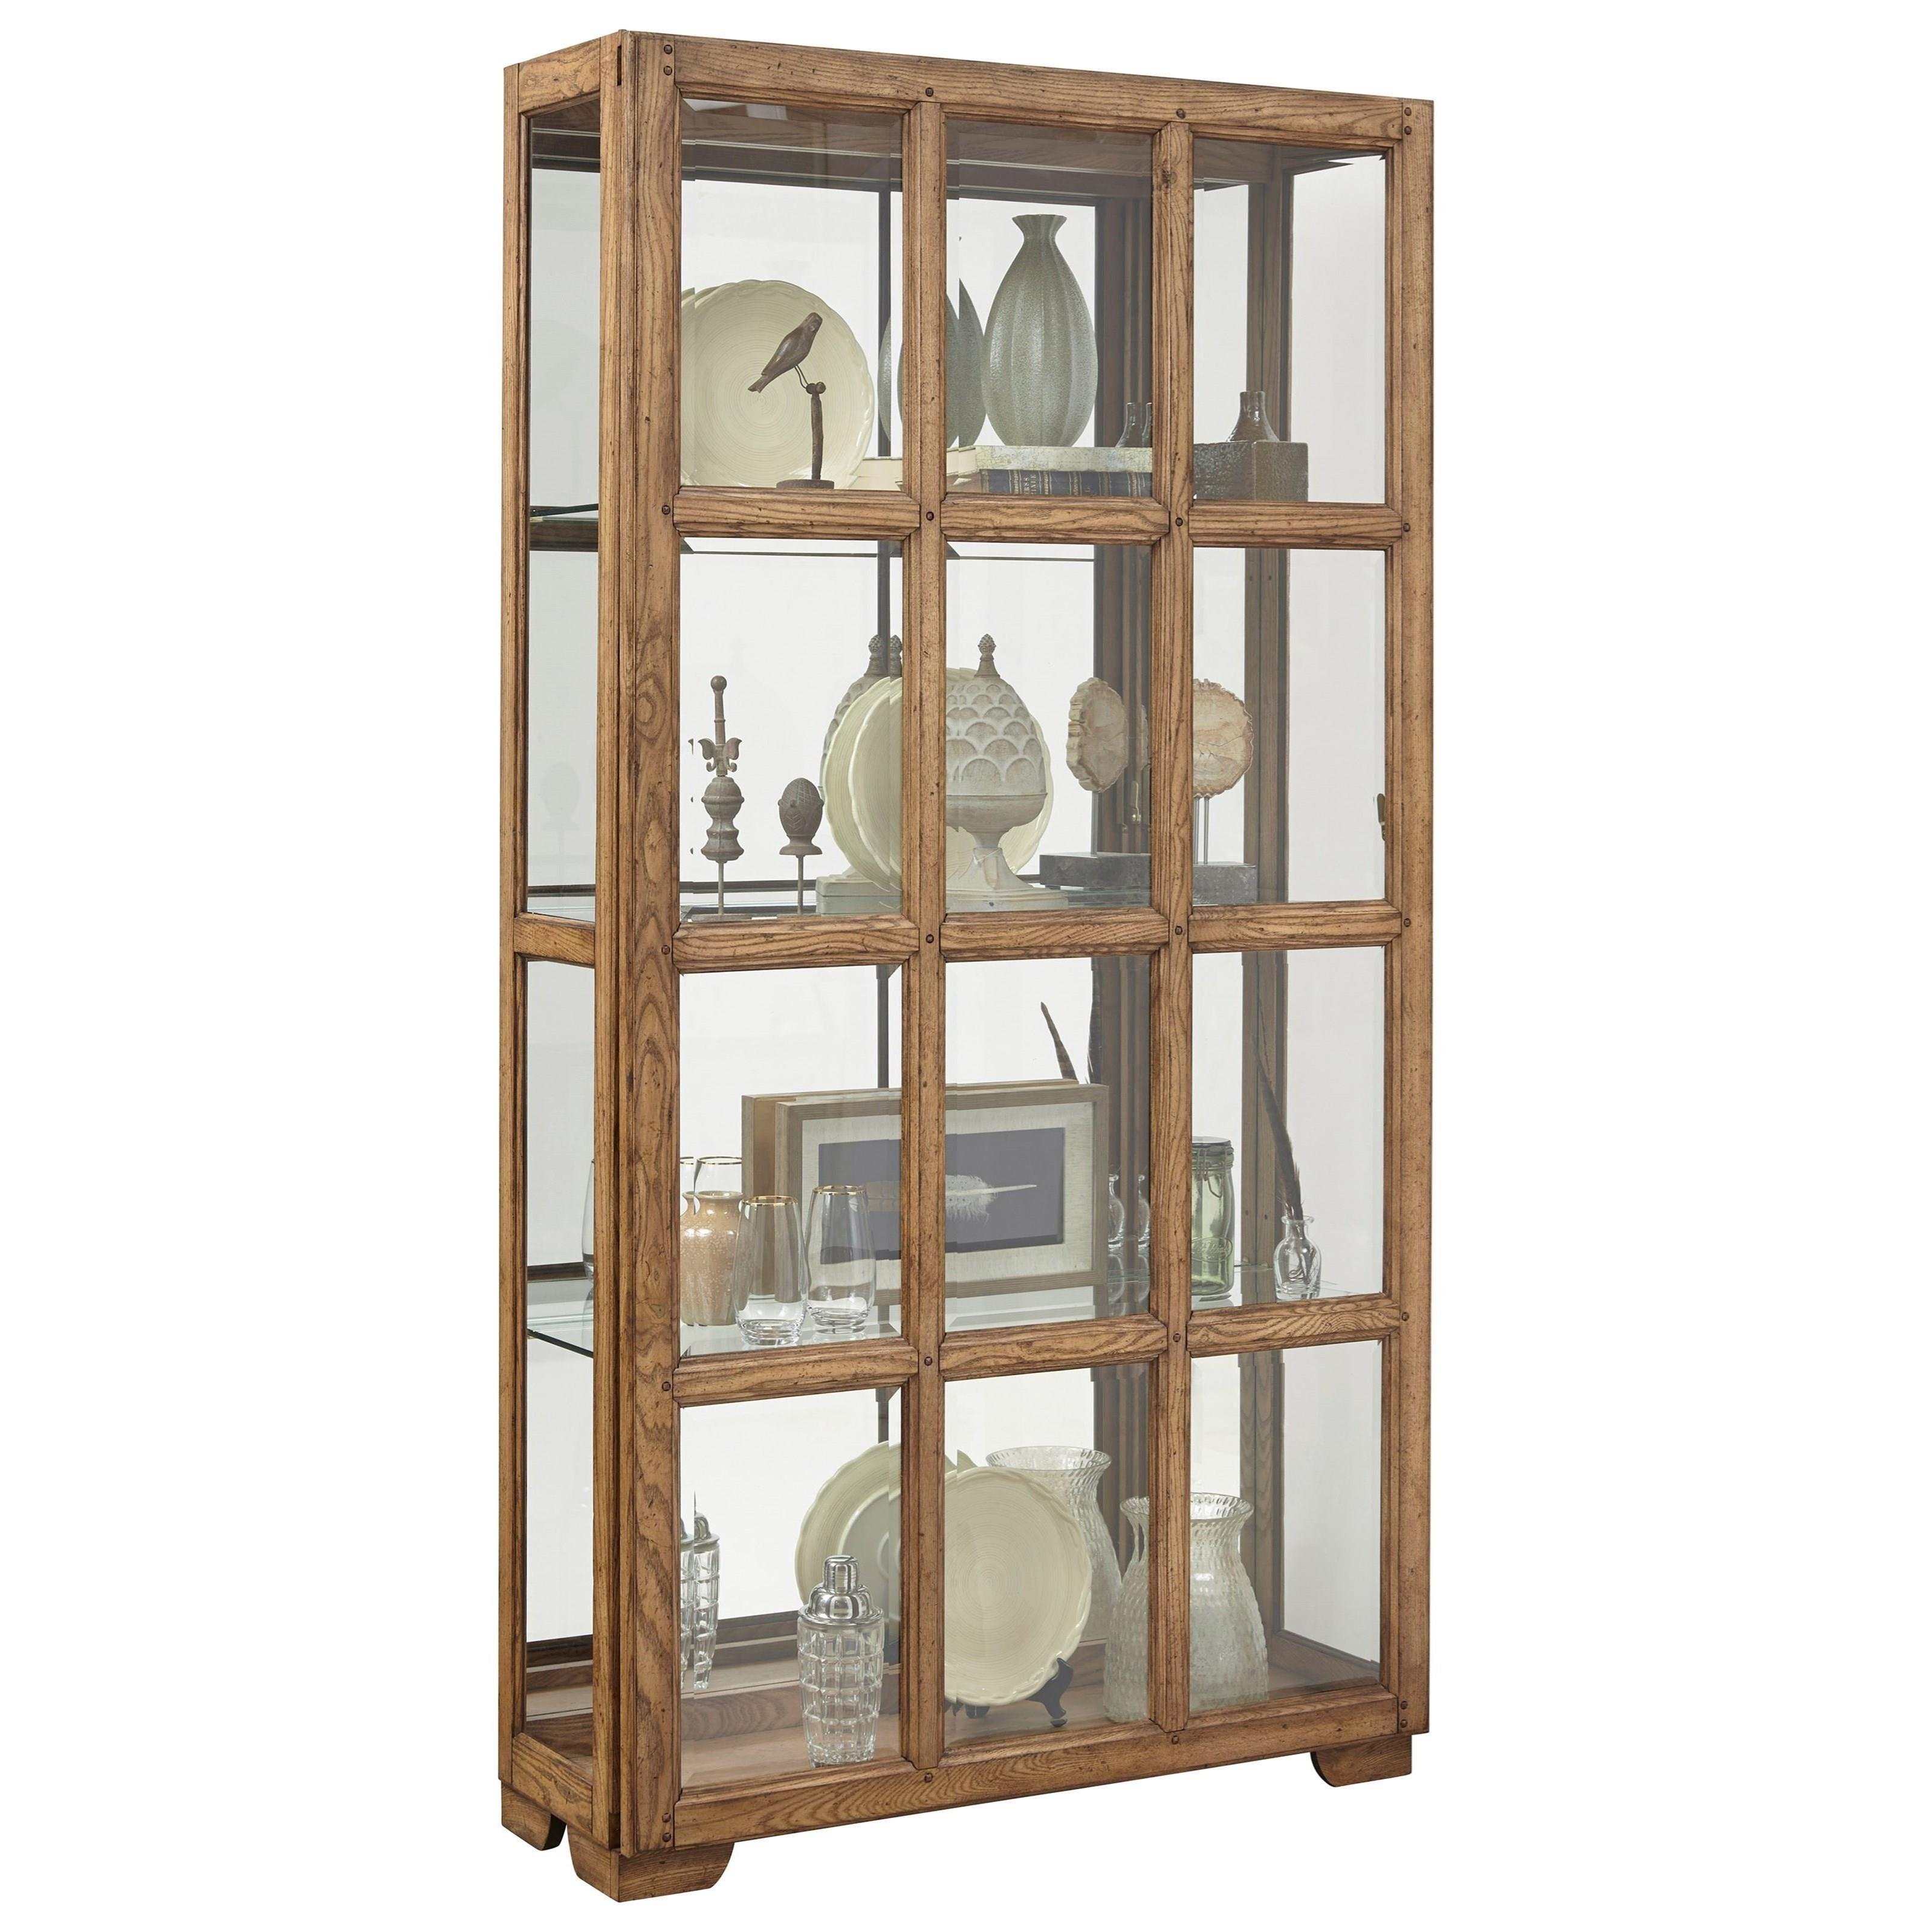 Curios Sliding Door Curio by Pulaski Furniture at Baer's Furniture